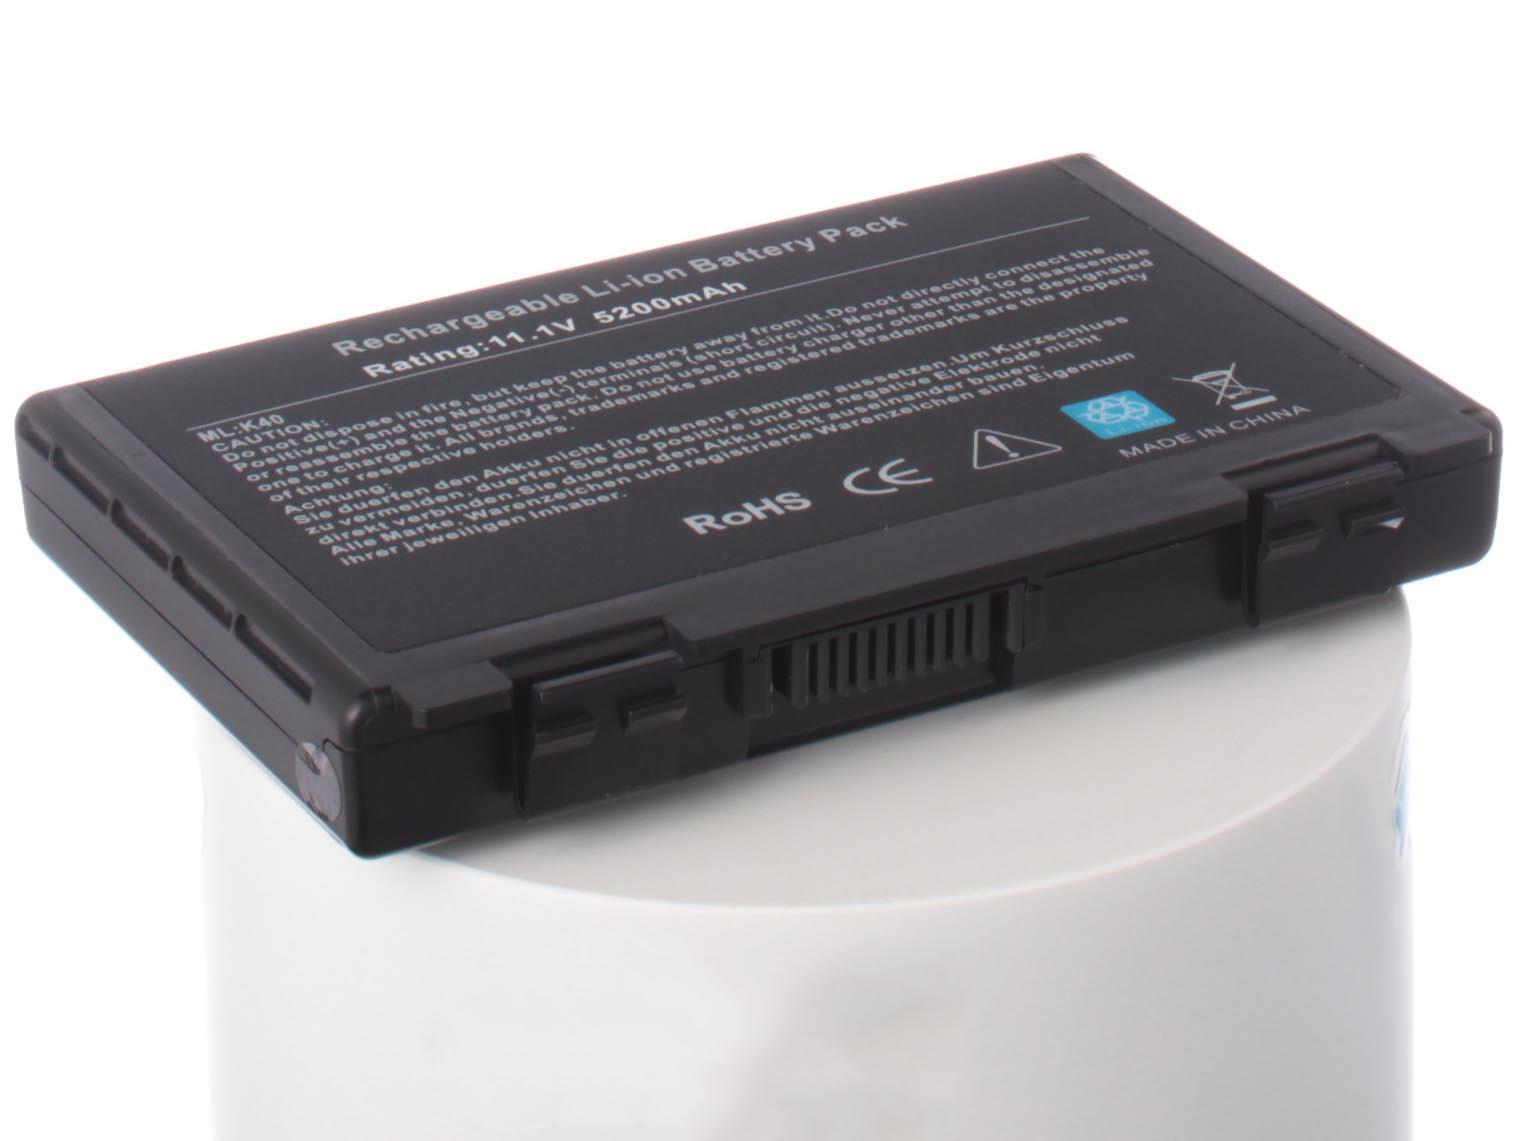 Аккумулятор для ноутбука iBatt для Asus X8AC, K70ID, K70IC, PRO5DI, PRO5DIP, K40ID, K40C, PRO5DIJ, K70AF, P81IJ, X5DC, K51IO, X8AIJ, F52A, K50AD, F82A, K40IP, F52Q, X5DID, K40AD, K50J, K70AD, K61C, X5EAC, PRO59, K70IJ, K70AC аккумулятор asus a32 f82 for k40 k50 p50